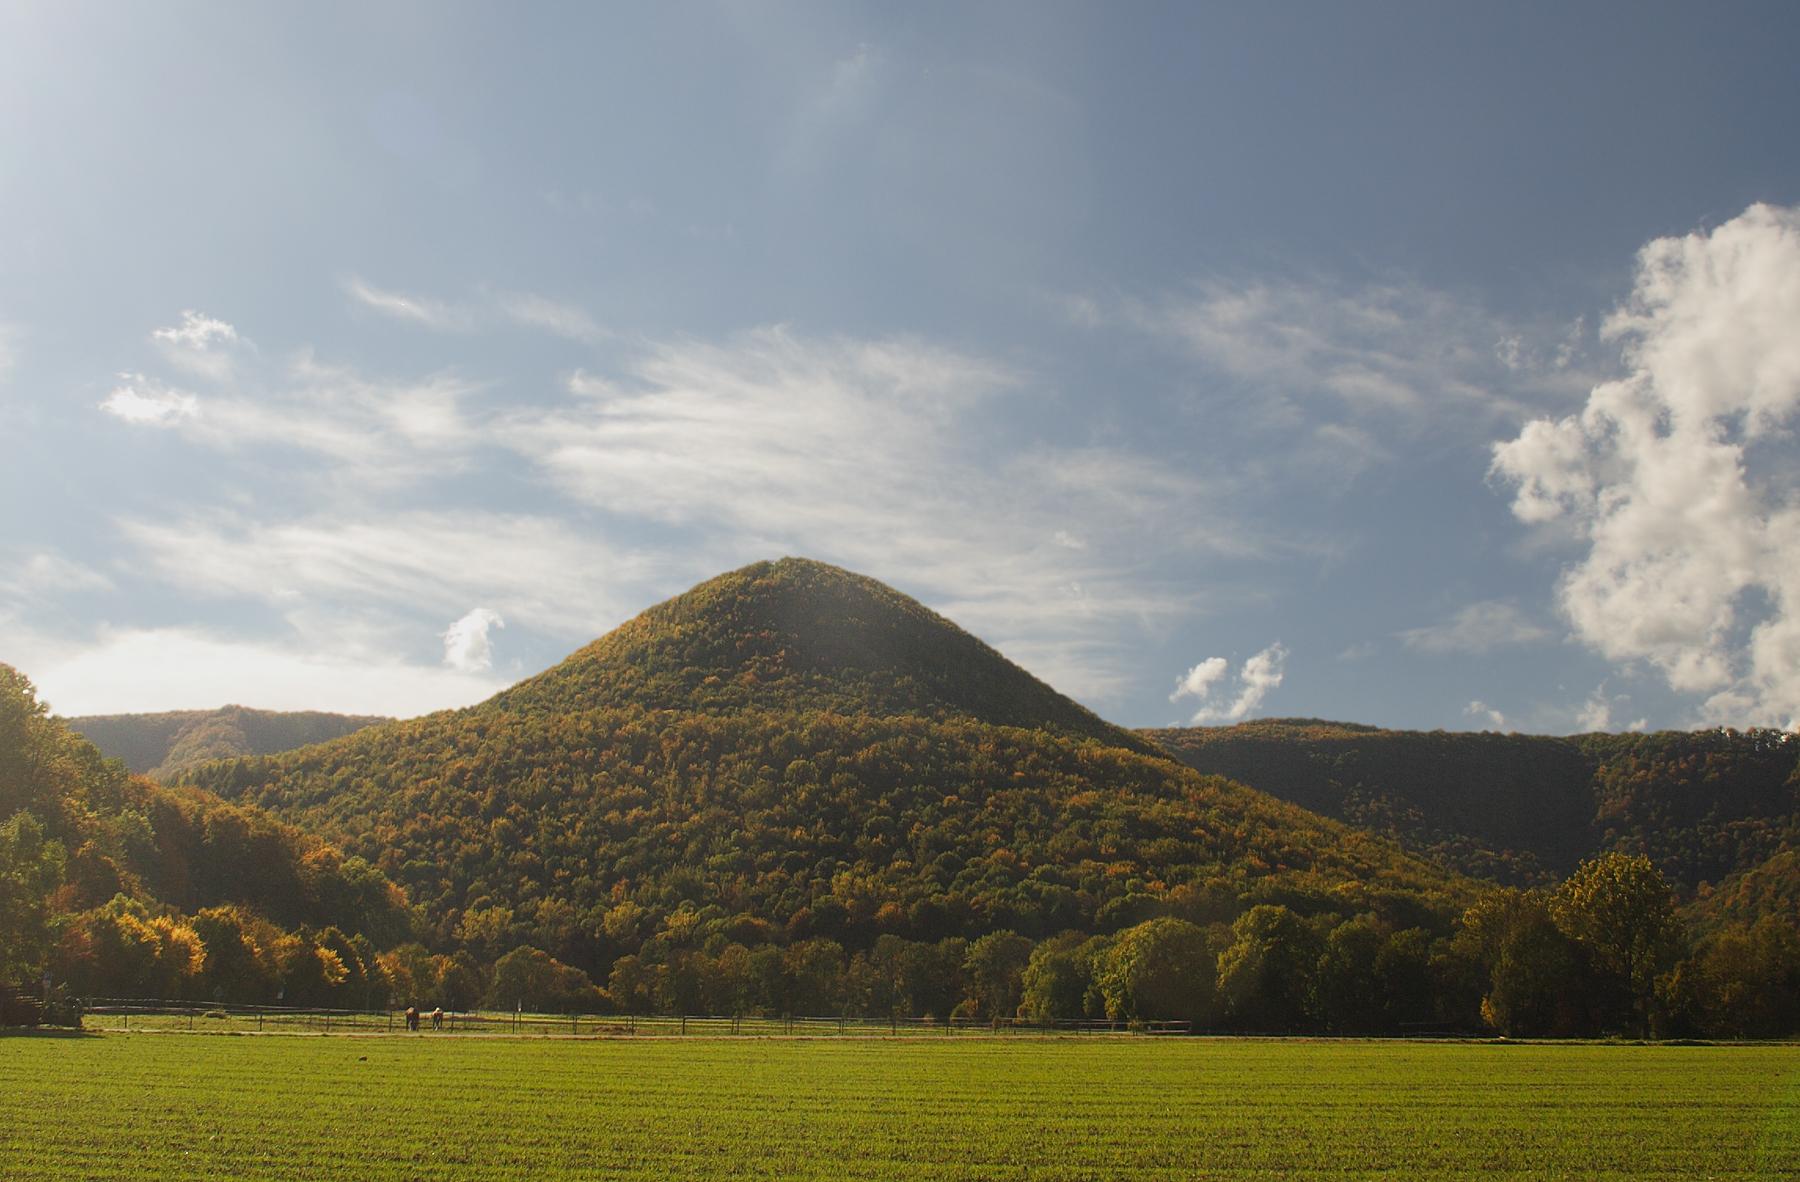 File:Runder Berg.JPG - Wikimedia Commons